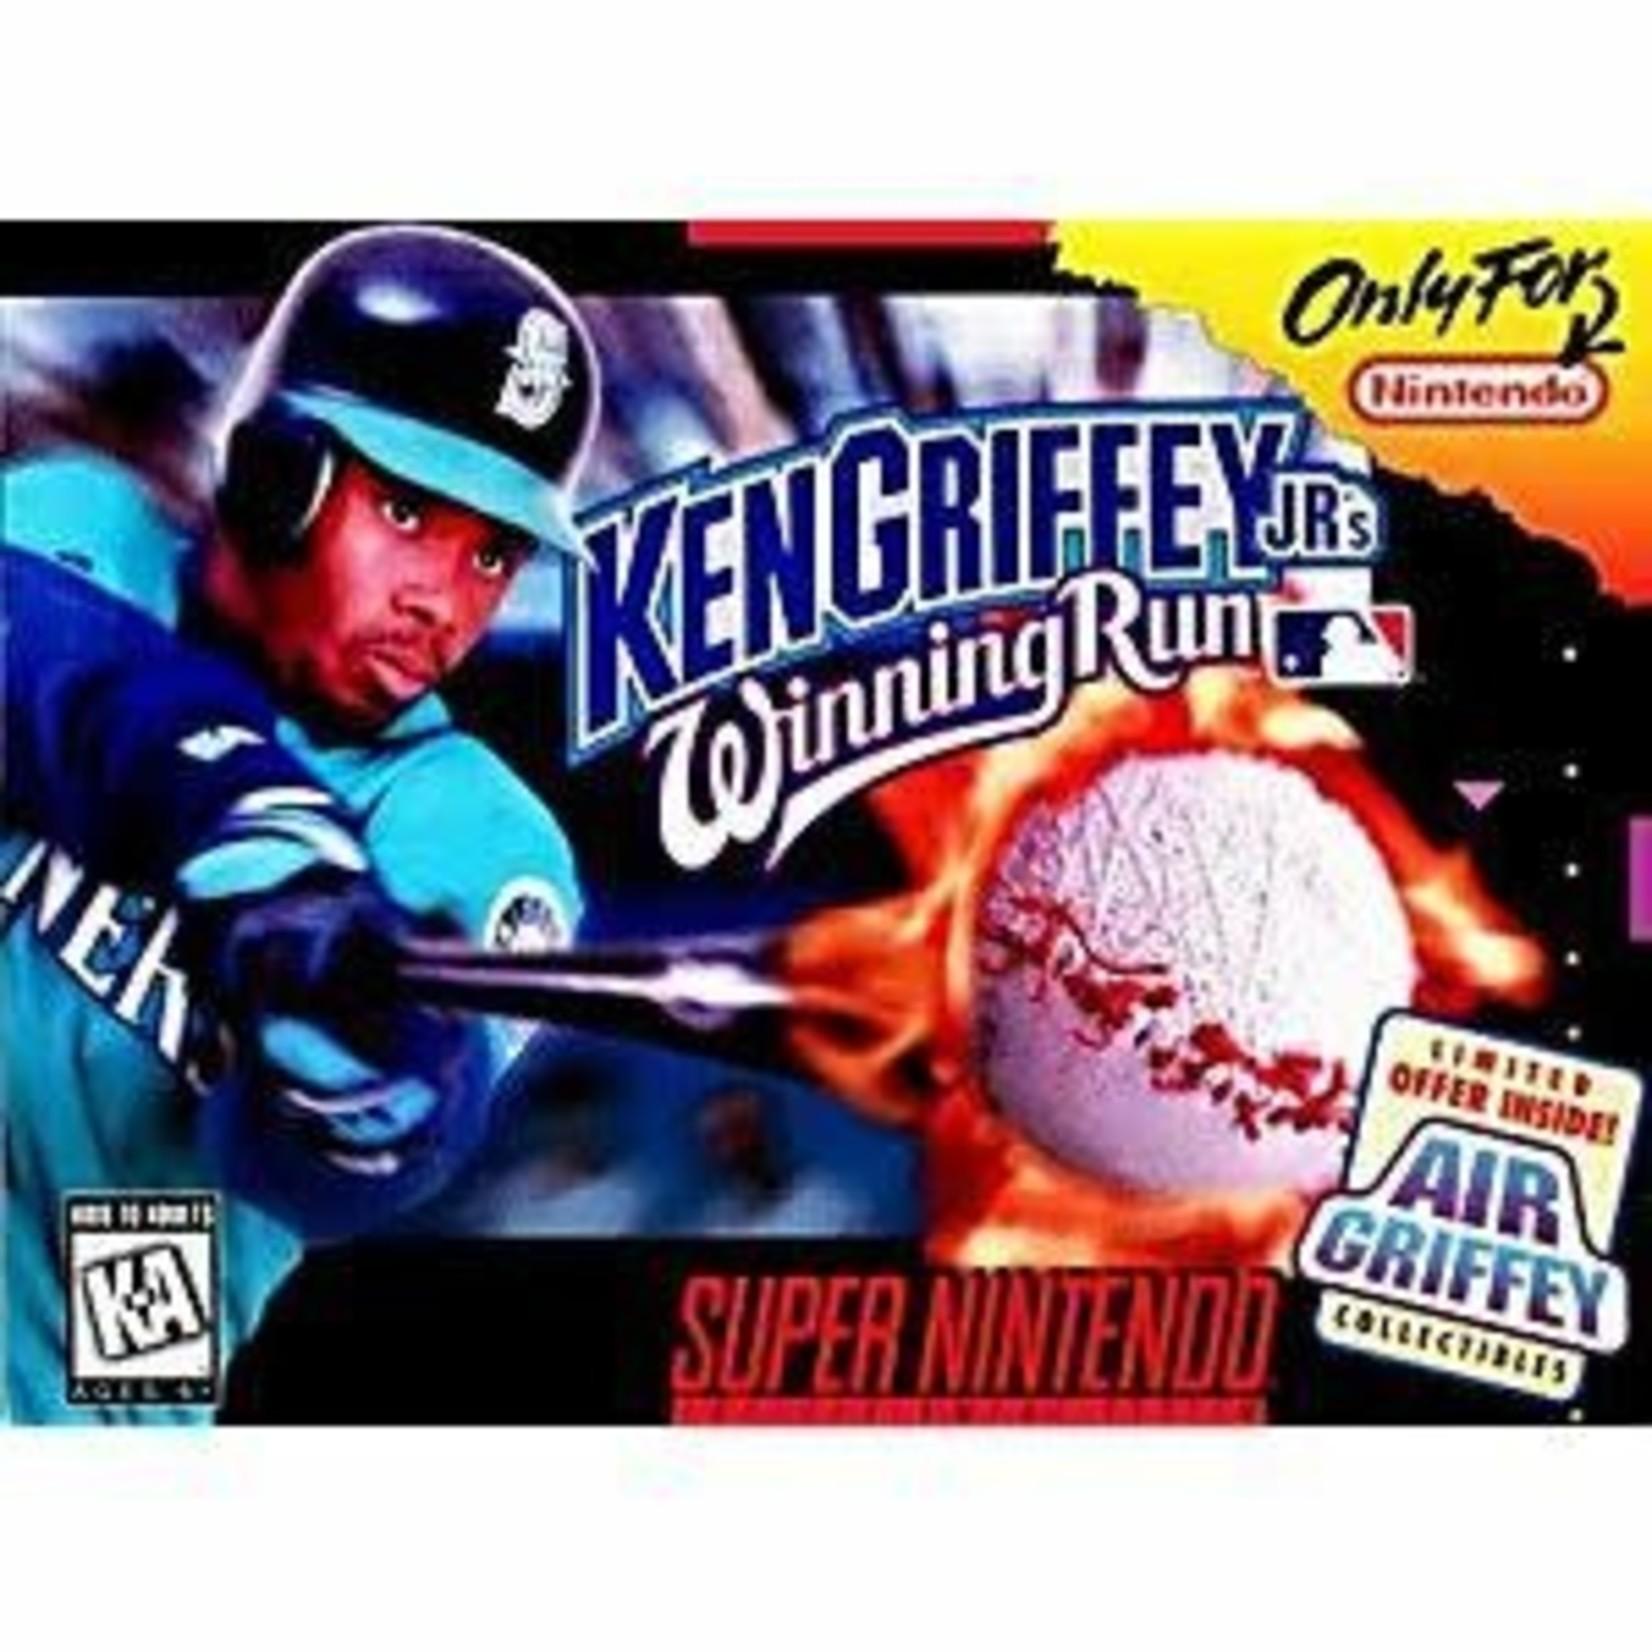 snesu-Ken Griffey Jr's Winning Run (cartridge)